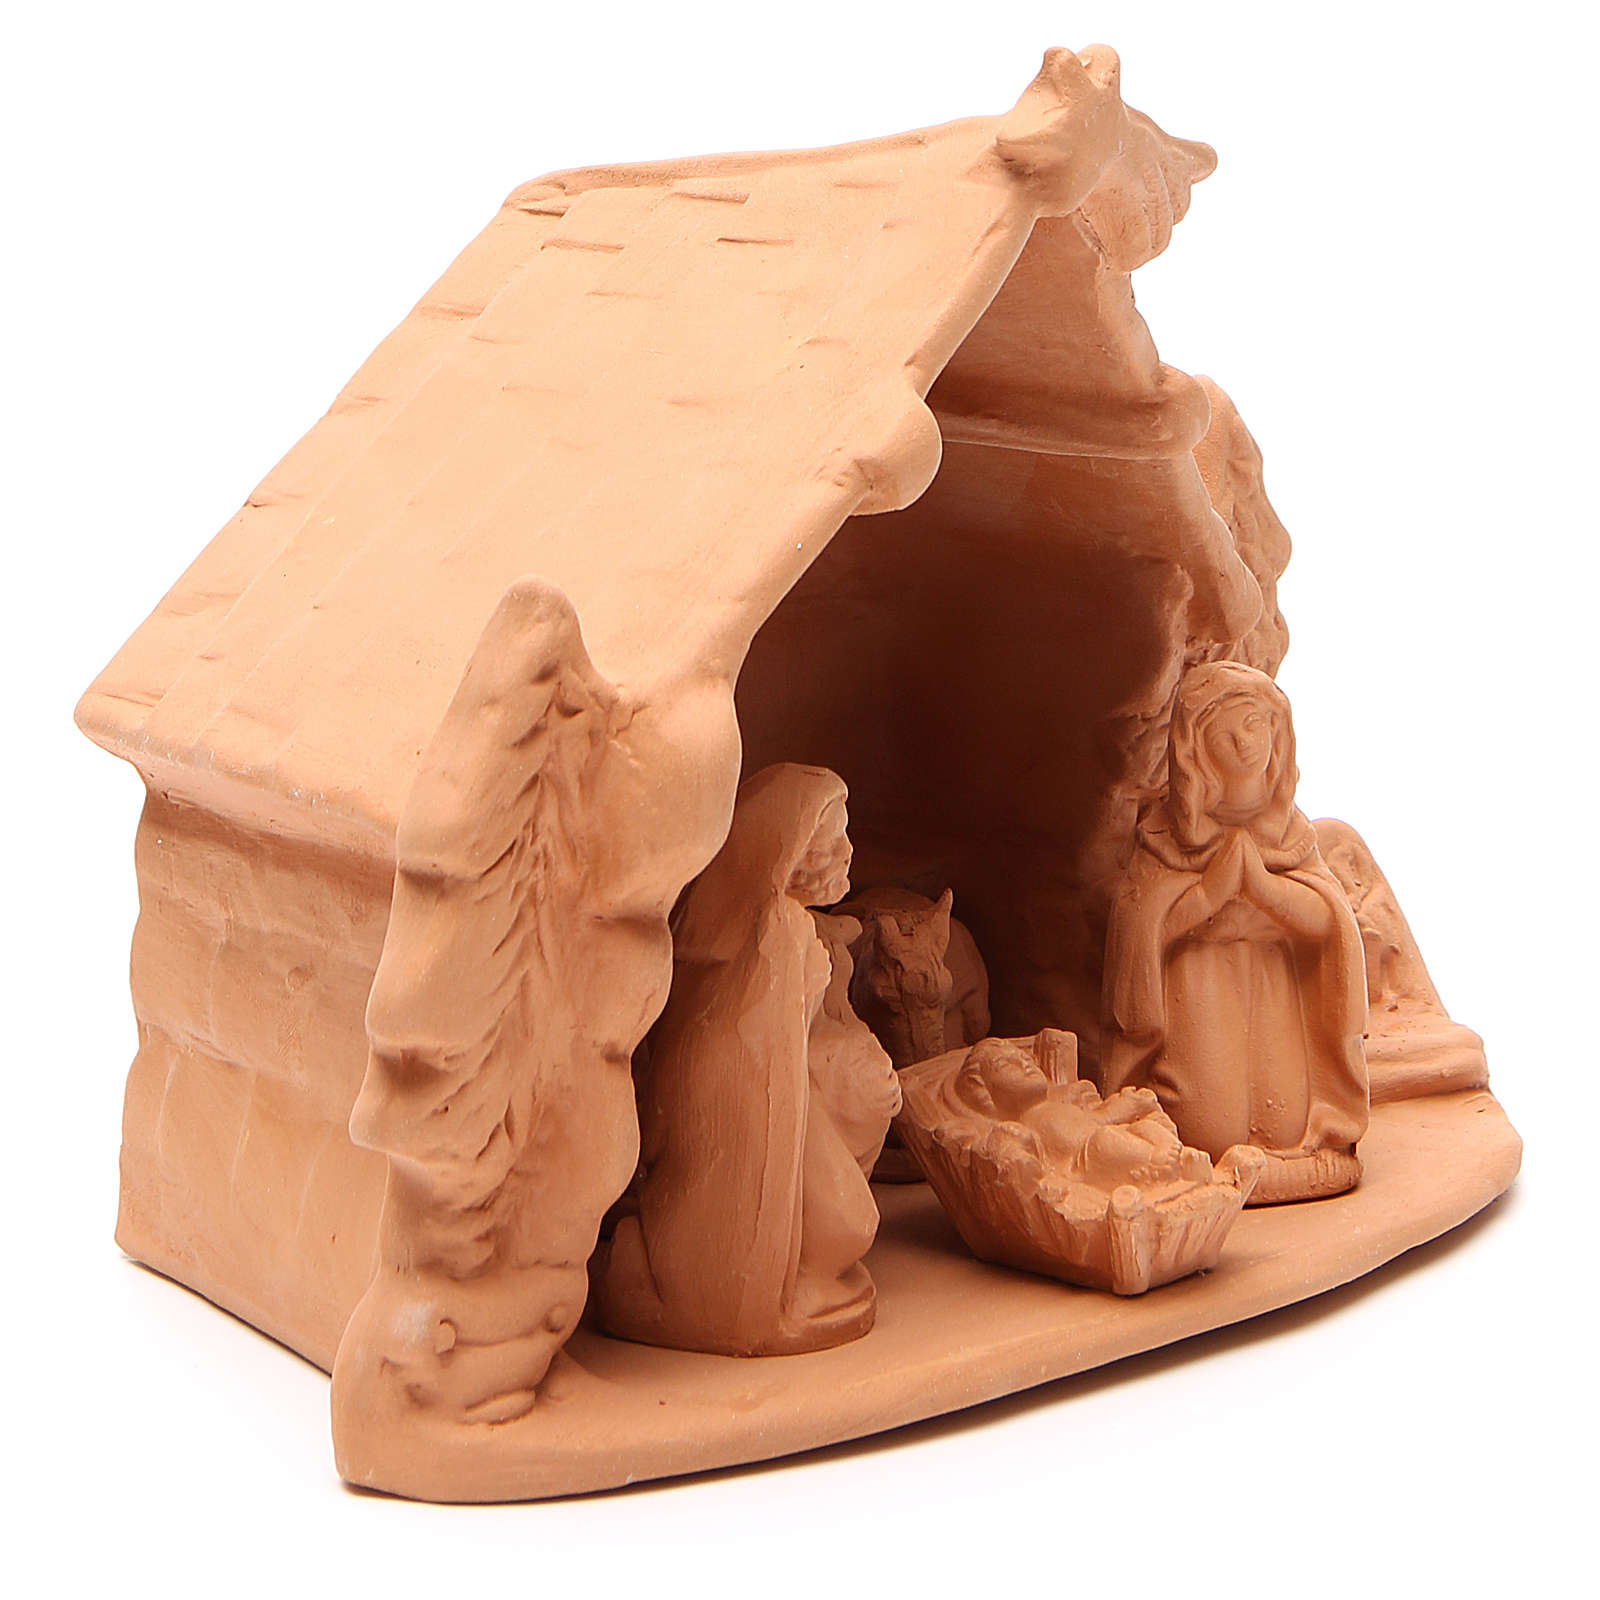 Capanna e Natività terracotta naturale h 20x24x14 cm 4